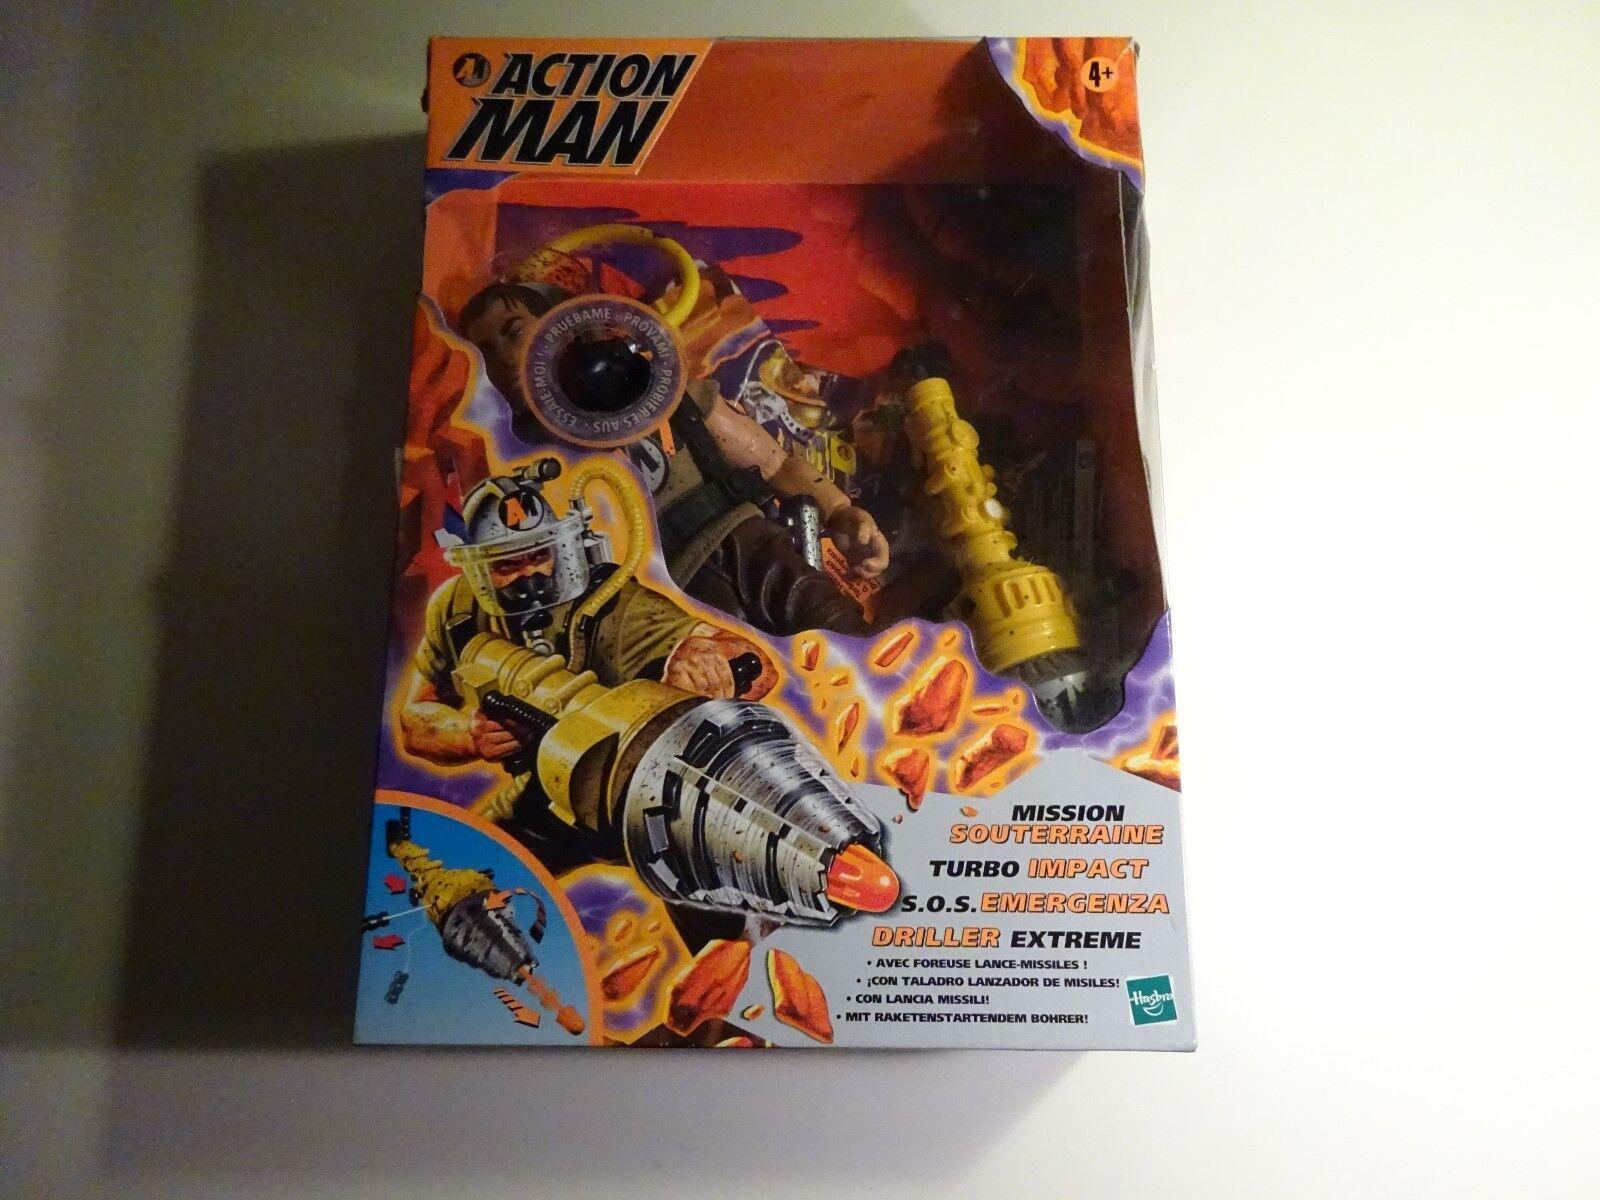 Action Man Mission Souterraine Turbo Impact Emergenza Driller Extreme Hasbro Rar